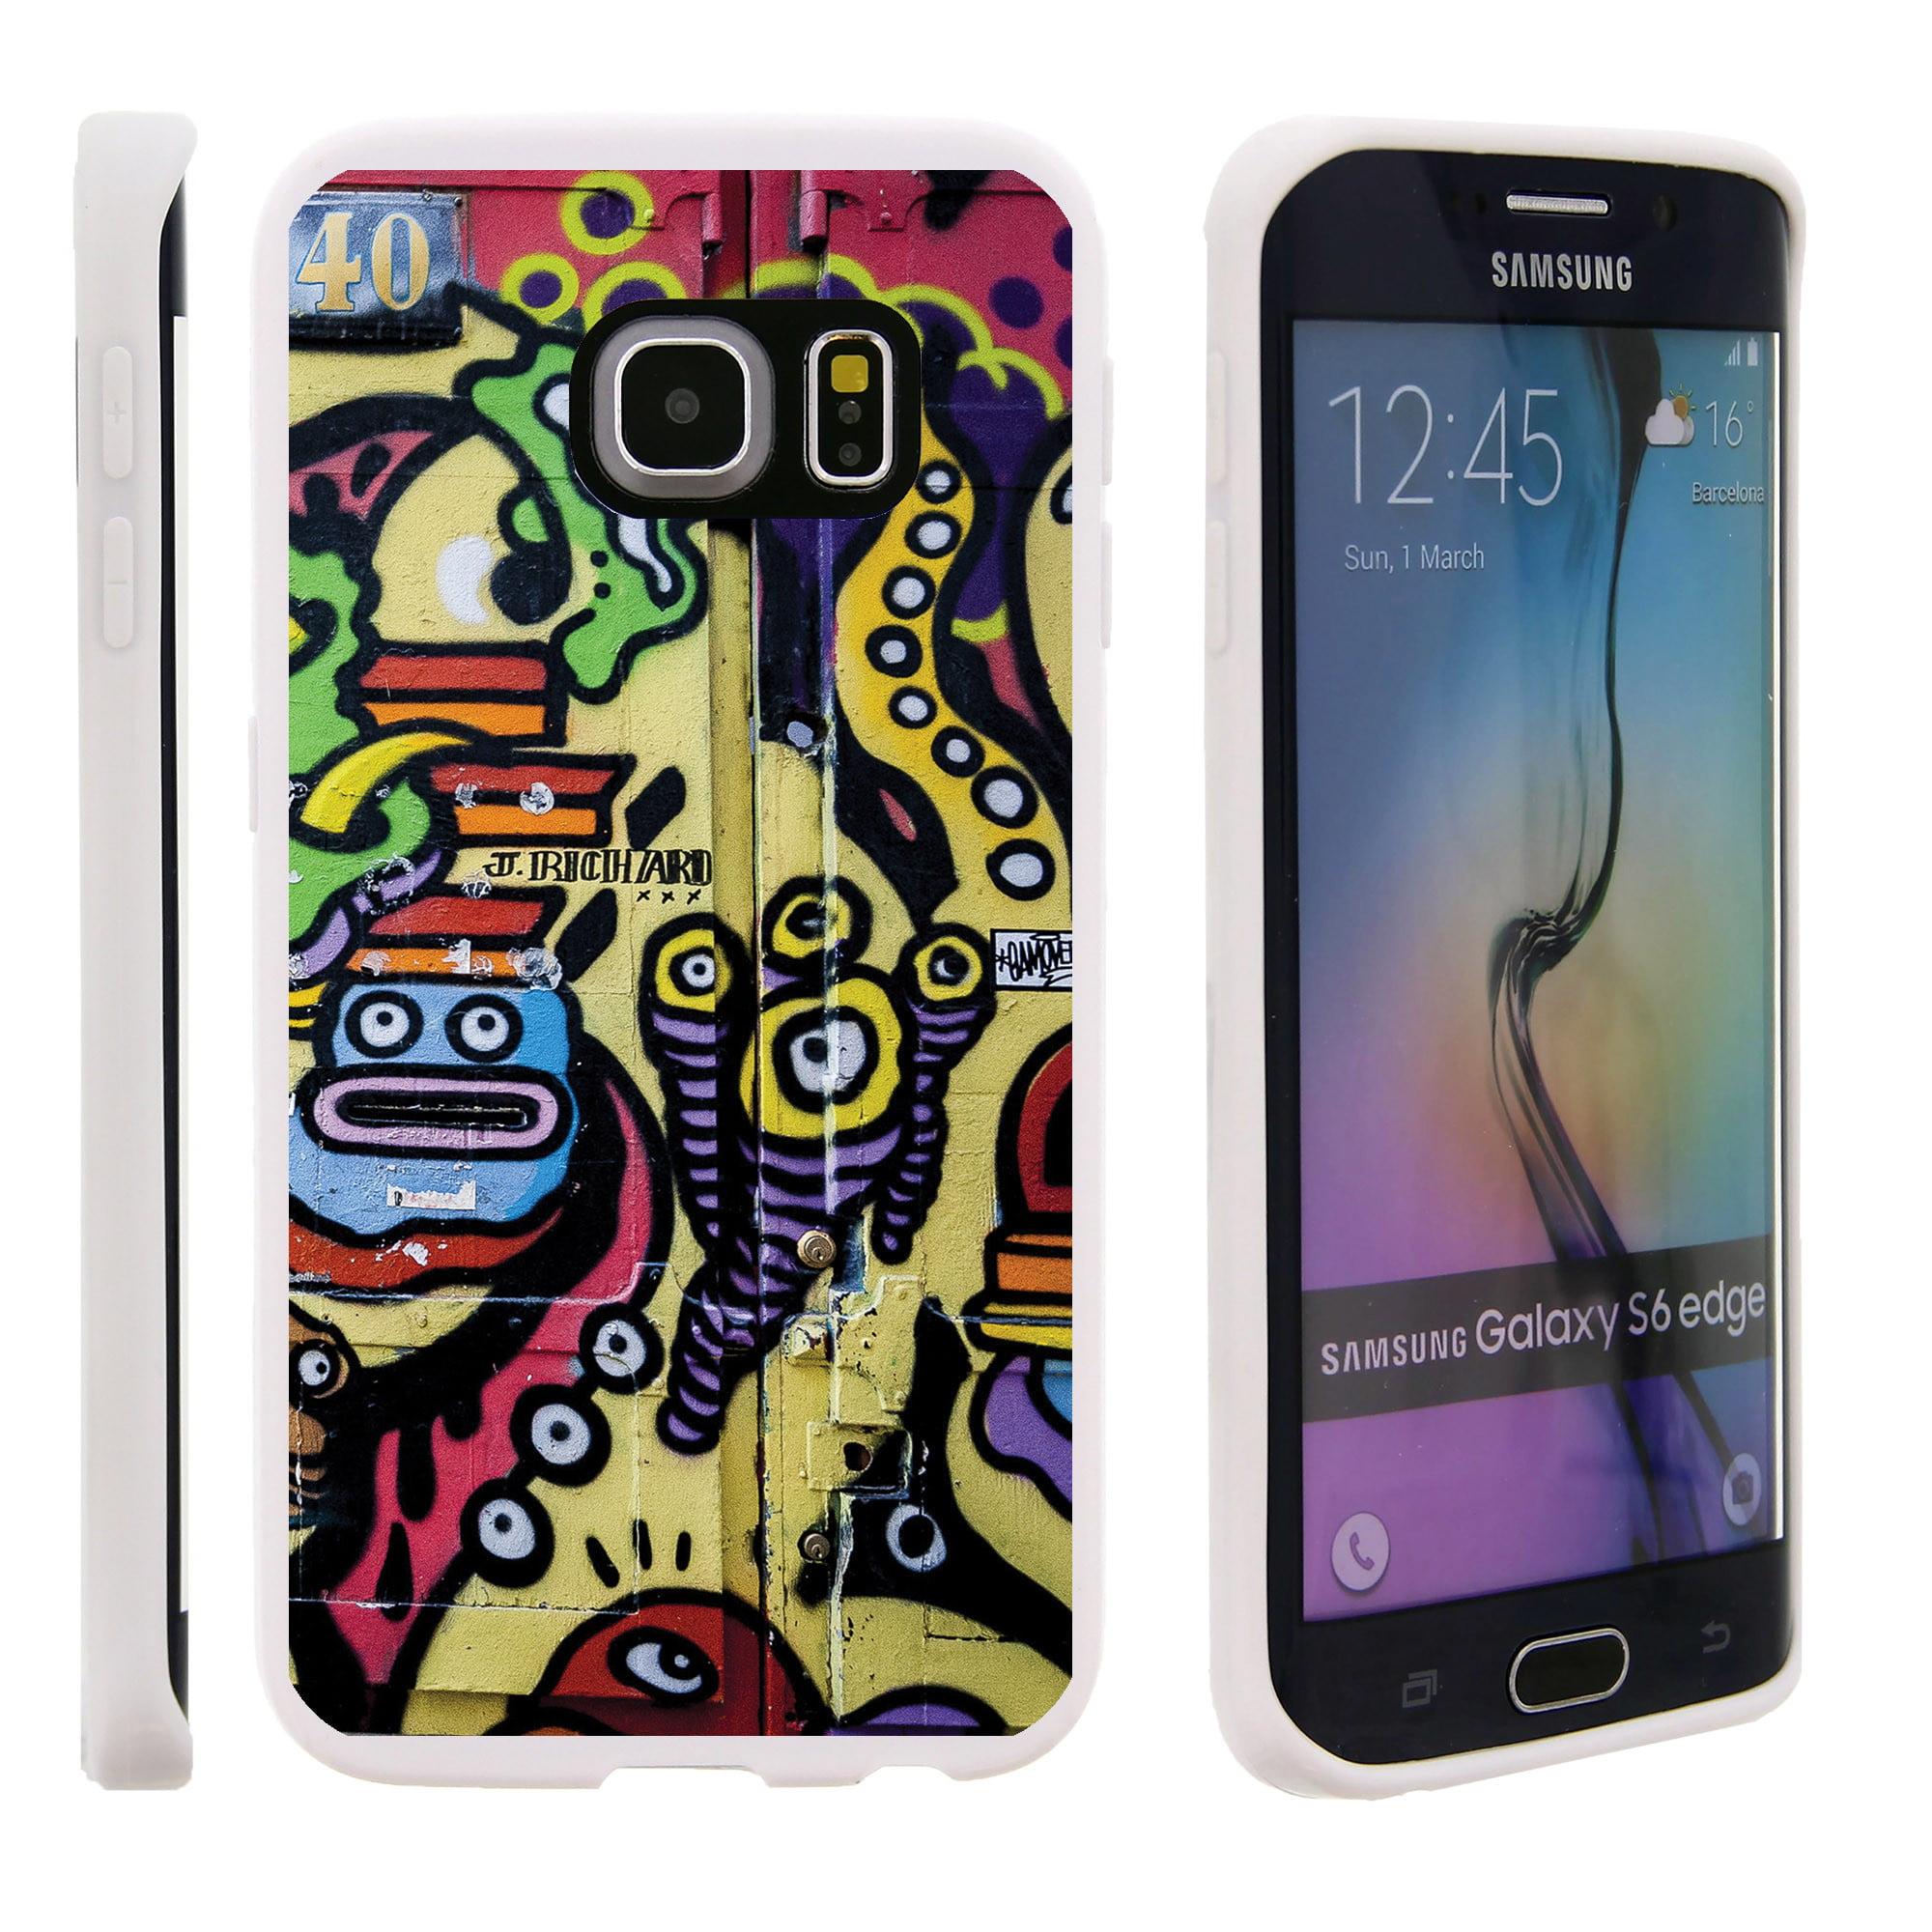 Samsung Galaxy S6 Edge G925, Flexible Case [FLEX FORCE] Slim Durable TPU Sleek Bumper with Unique Designs - Faces on Walls